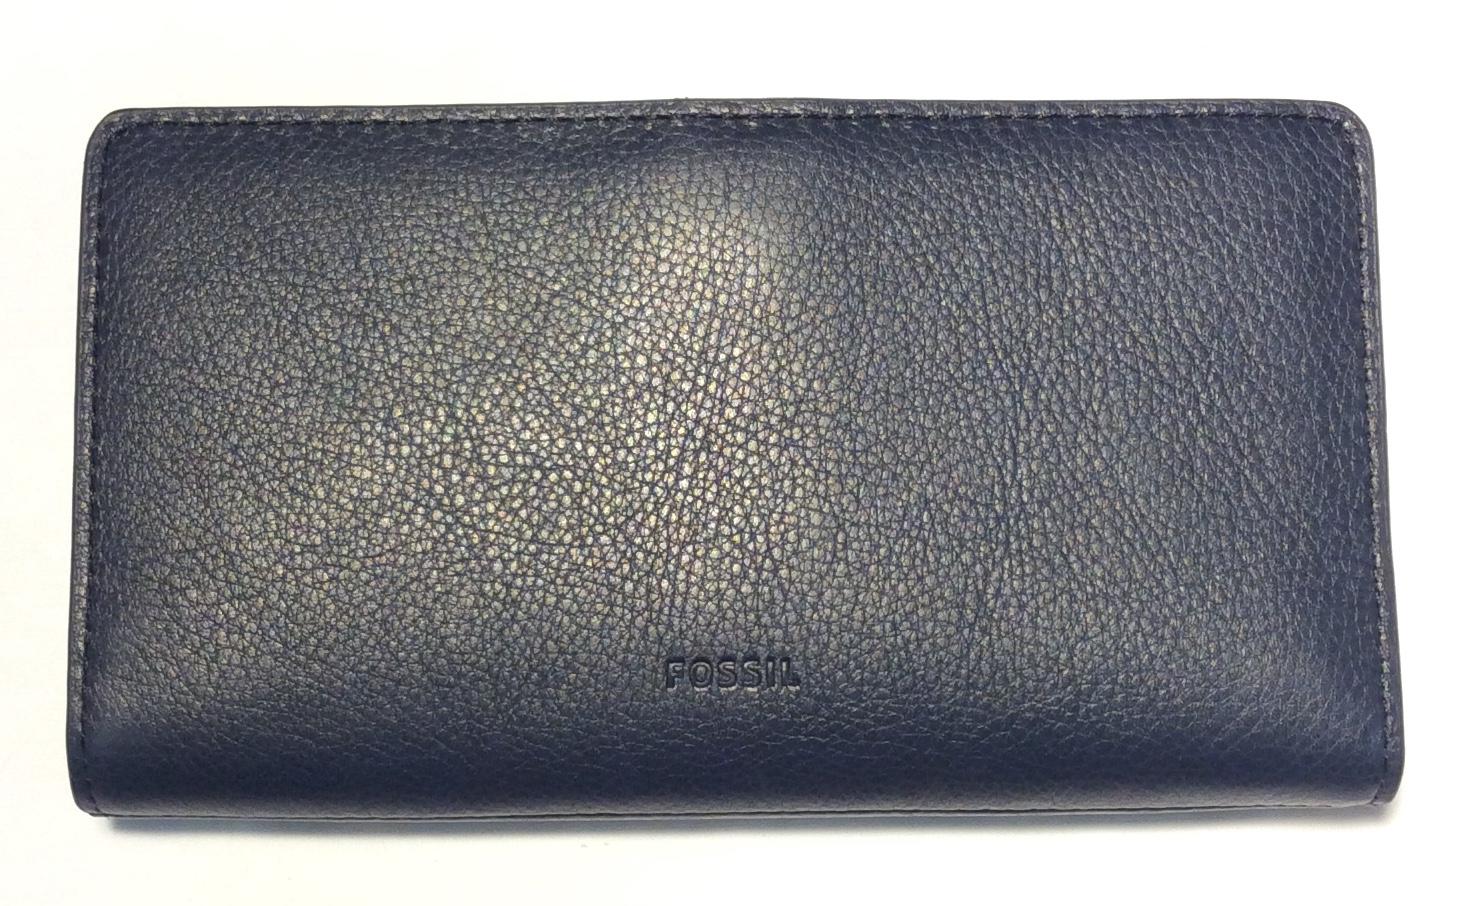 Fossil Dark blue leather wallet